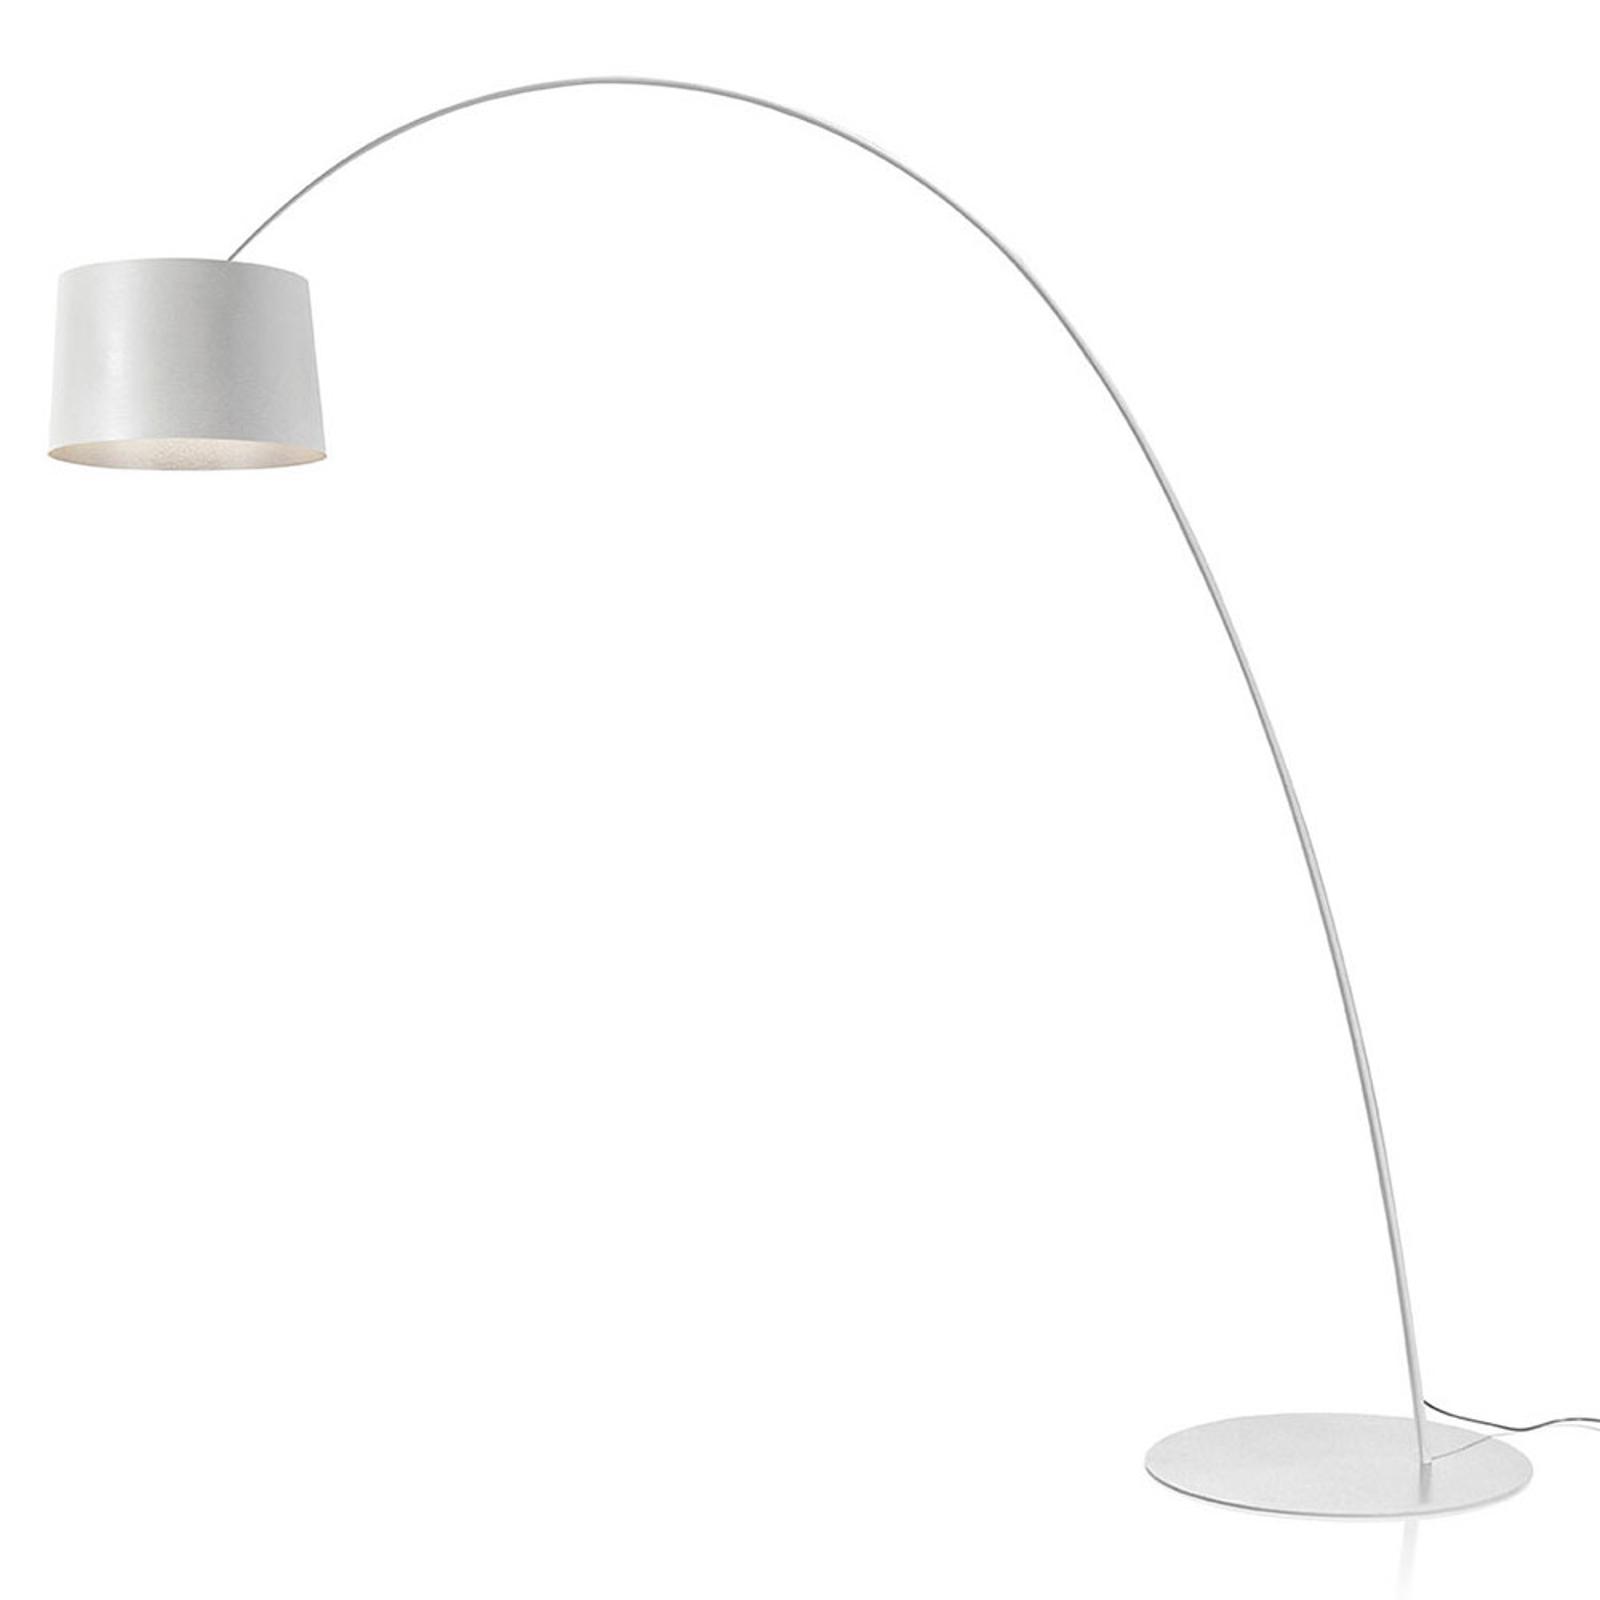 Foscarini Twiggy MyLight LED-gulvlampe CCT hvit